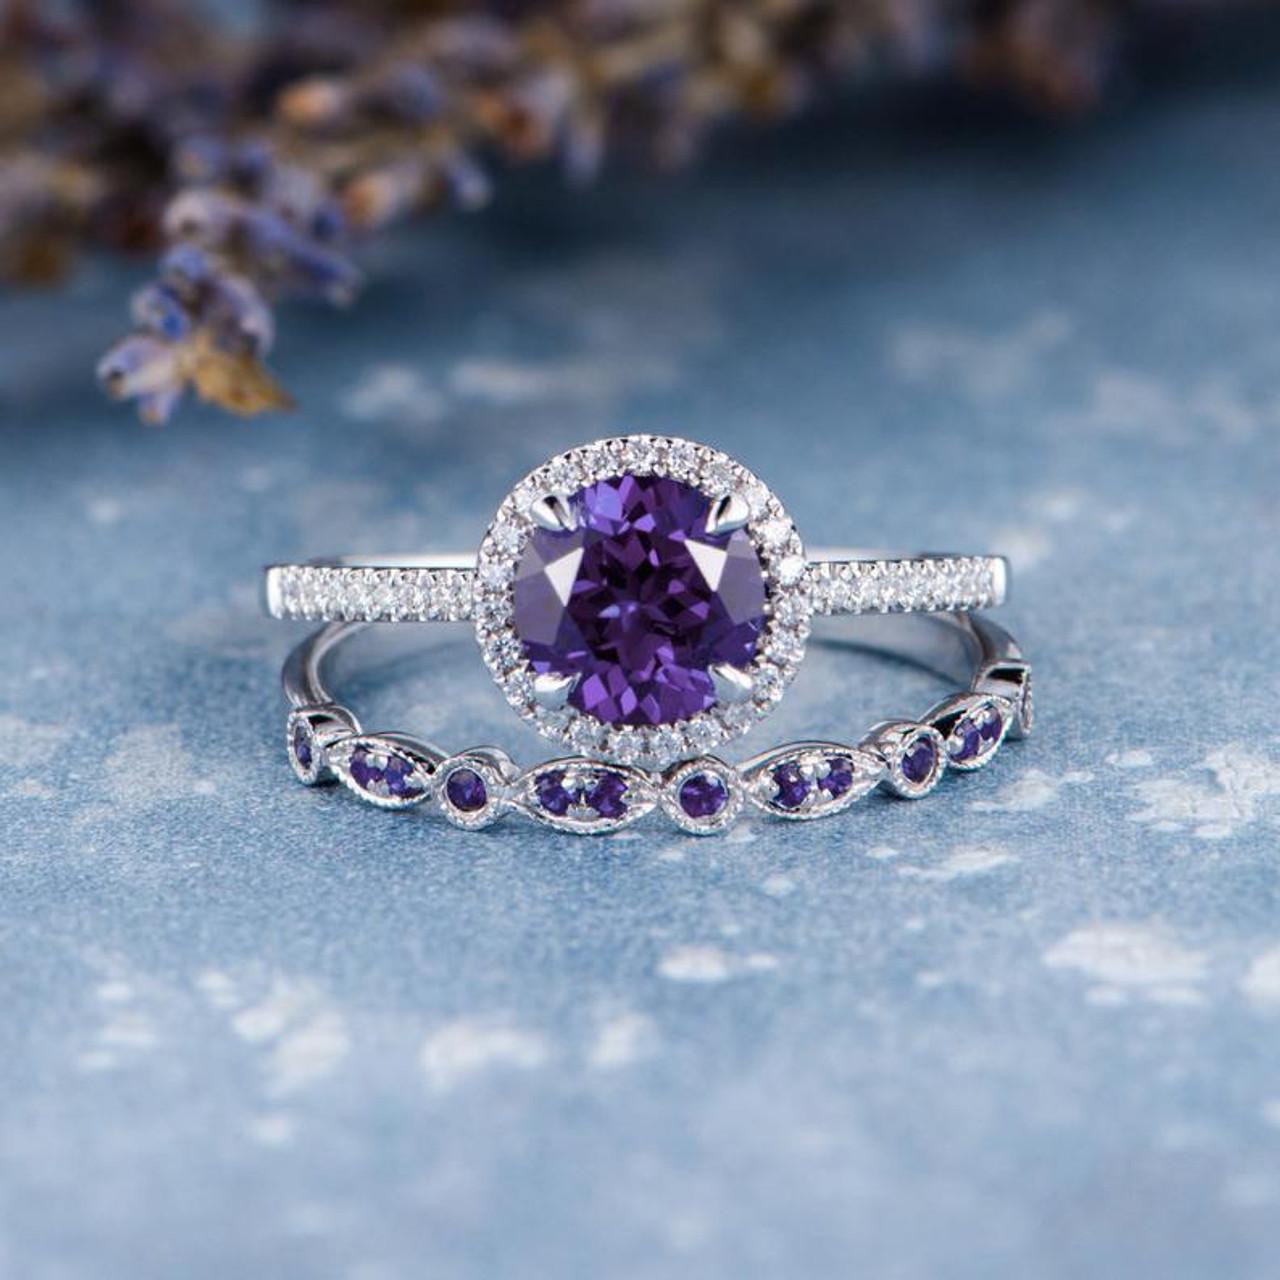 Amethyst Engagement Ring Amethyst Wedding Band Diamond White Gold Band Gift For Her Promise Women Anniversary February Birthstone 2pcs